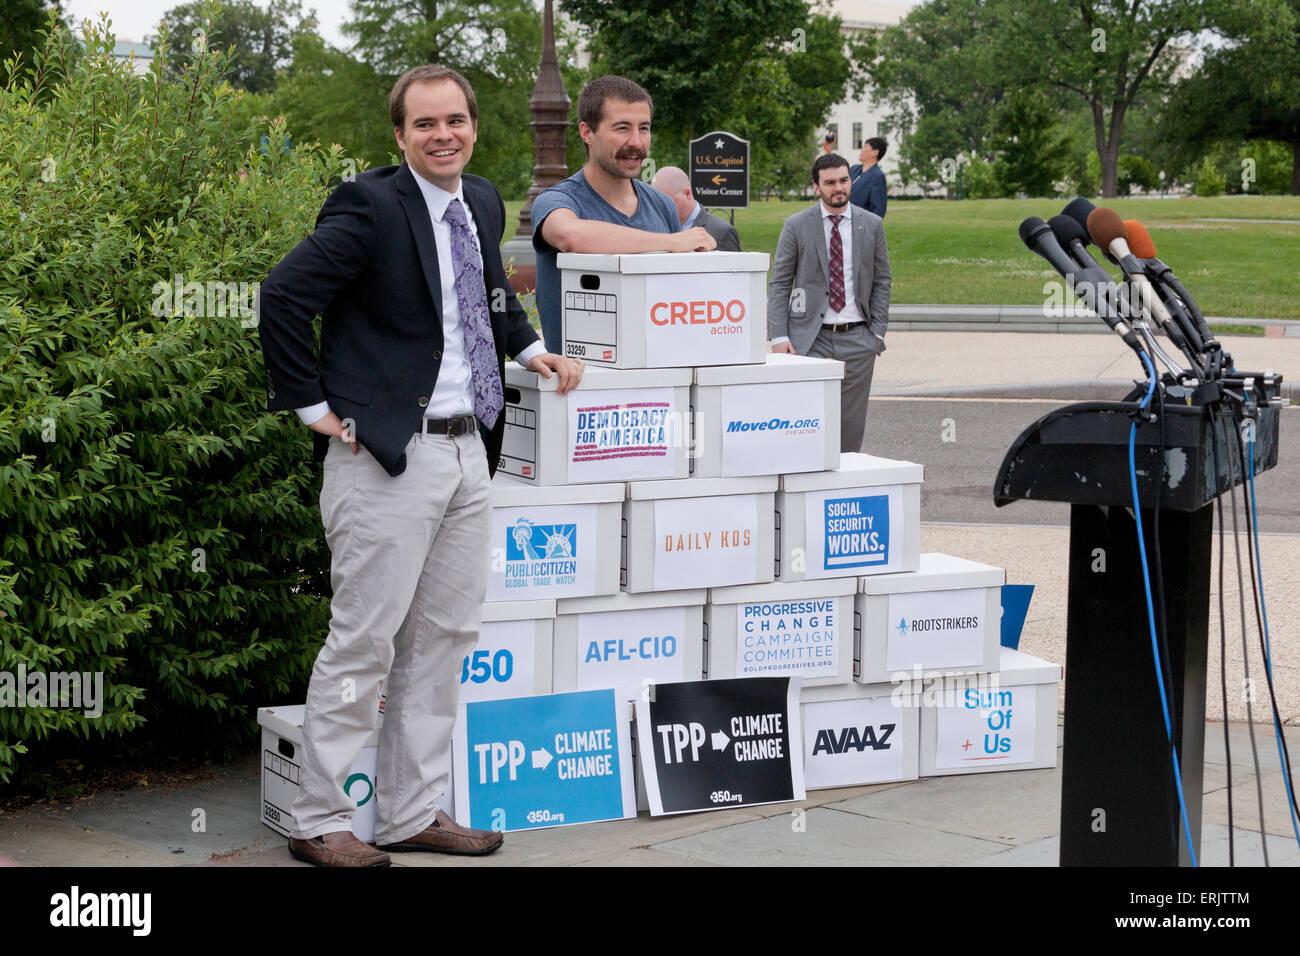 Washington DC, USA. 3 juin, 2015. Les organisations progressistes tels que l'ACTION DU CREDO, l'AFL-CIO, Photo Stock